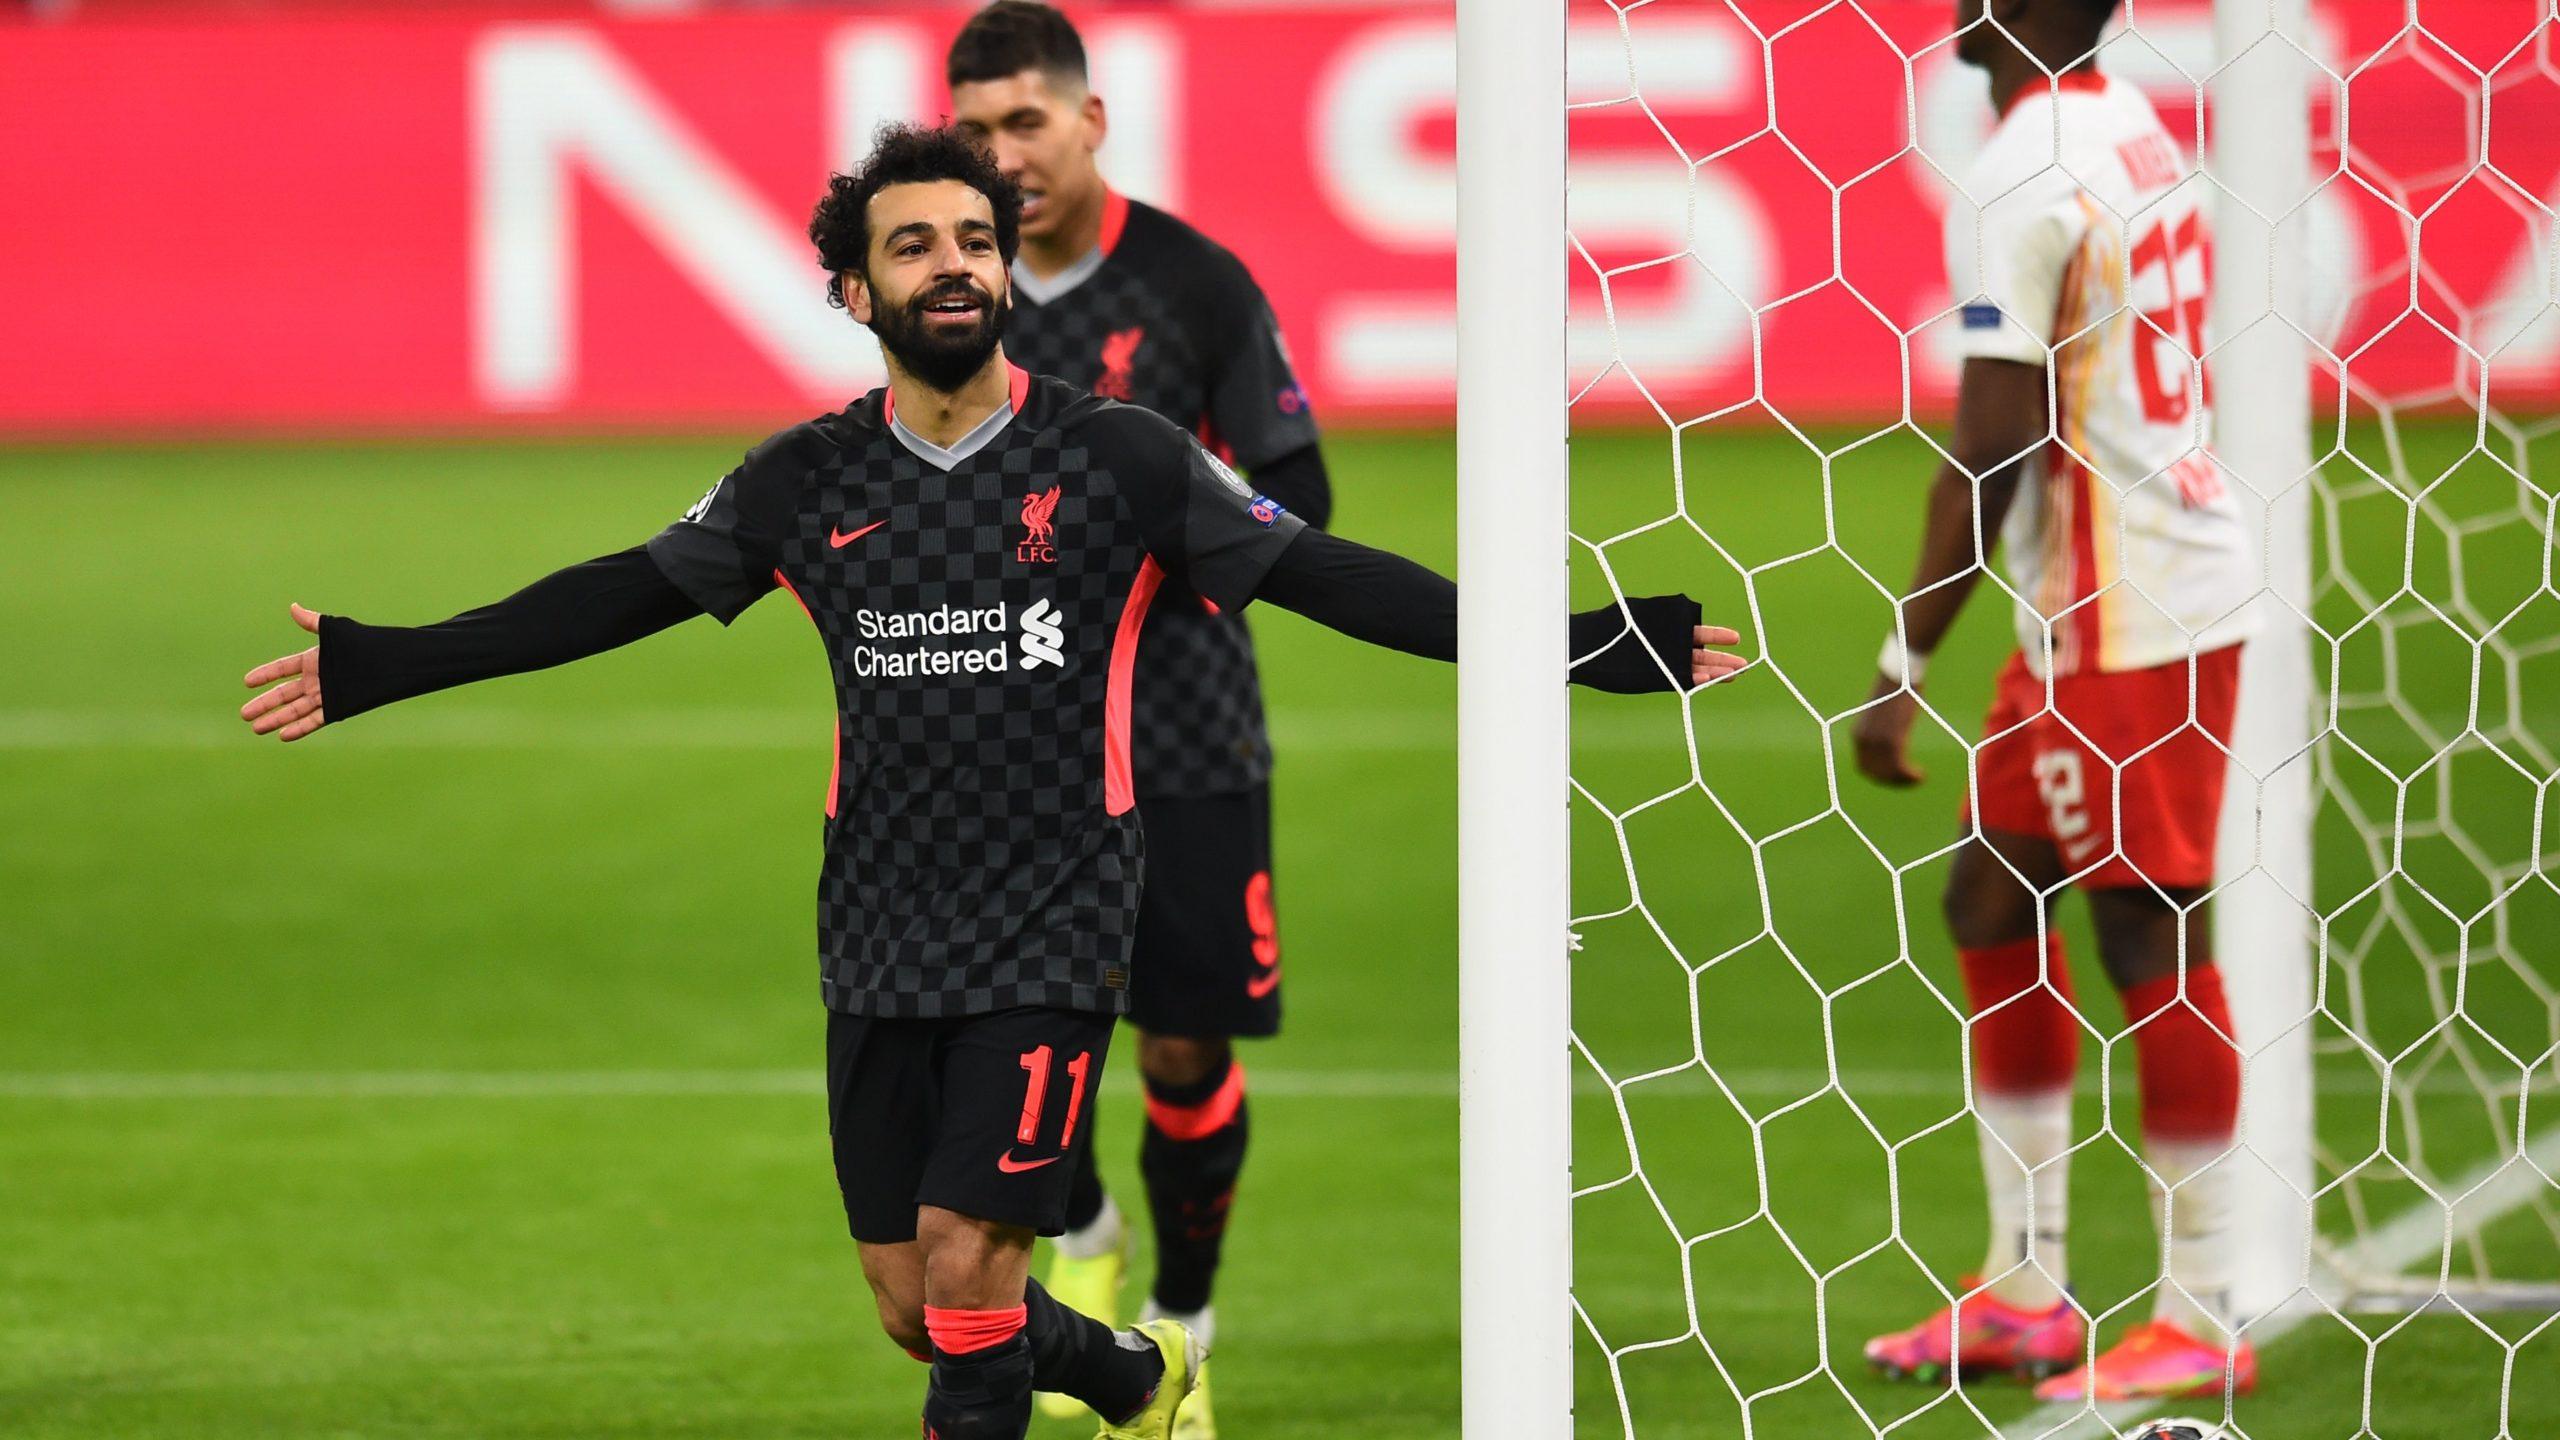 Preview Liverpool vs Everton